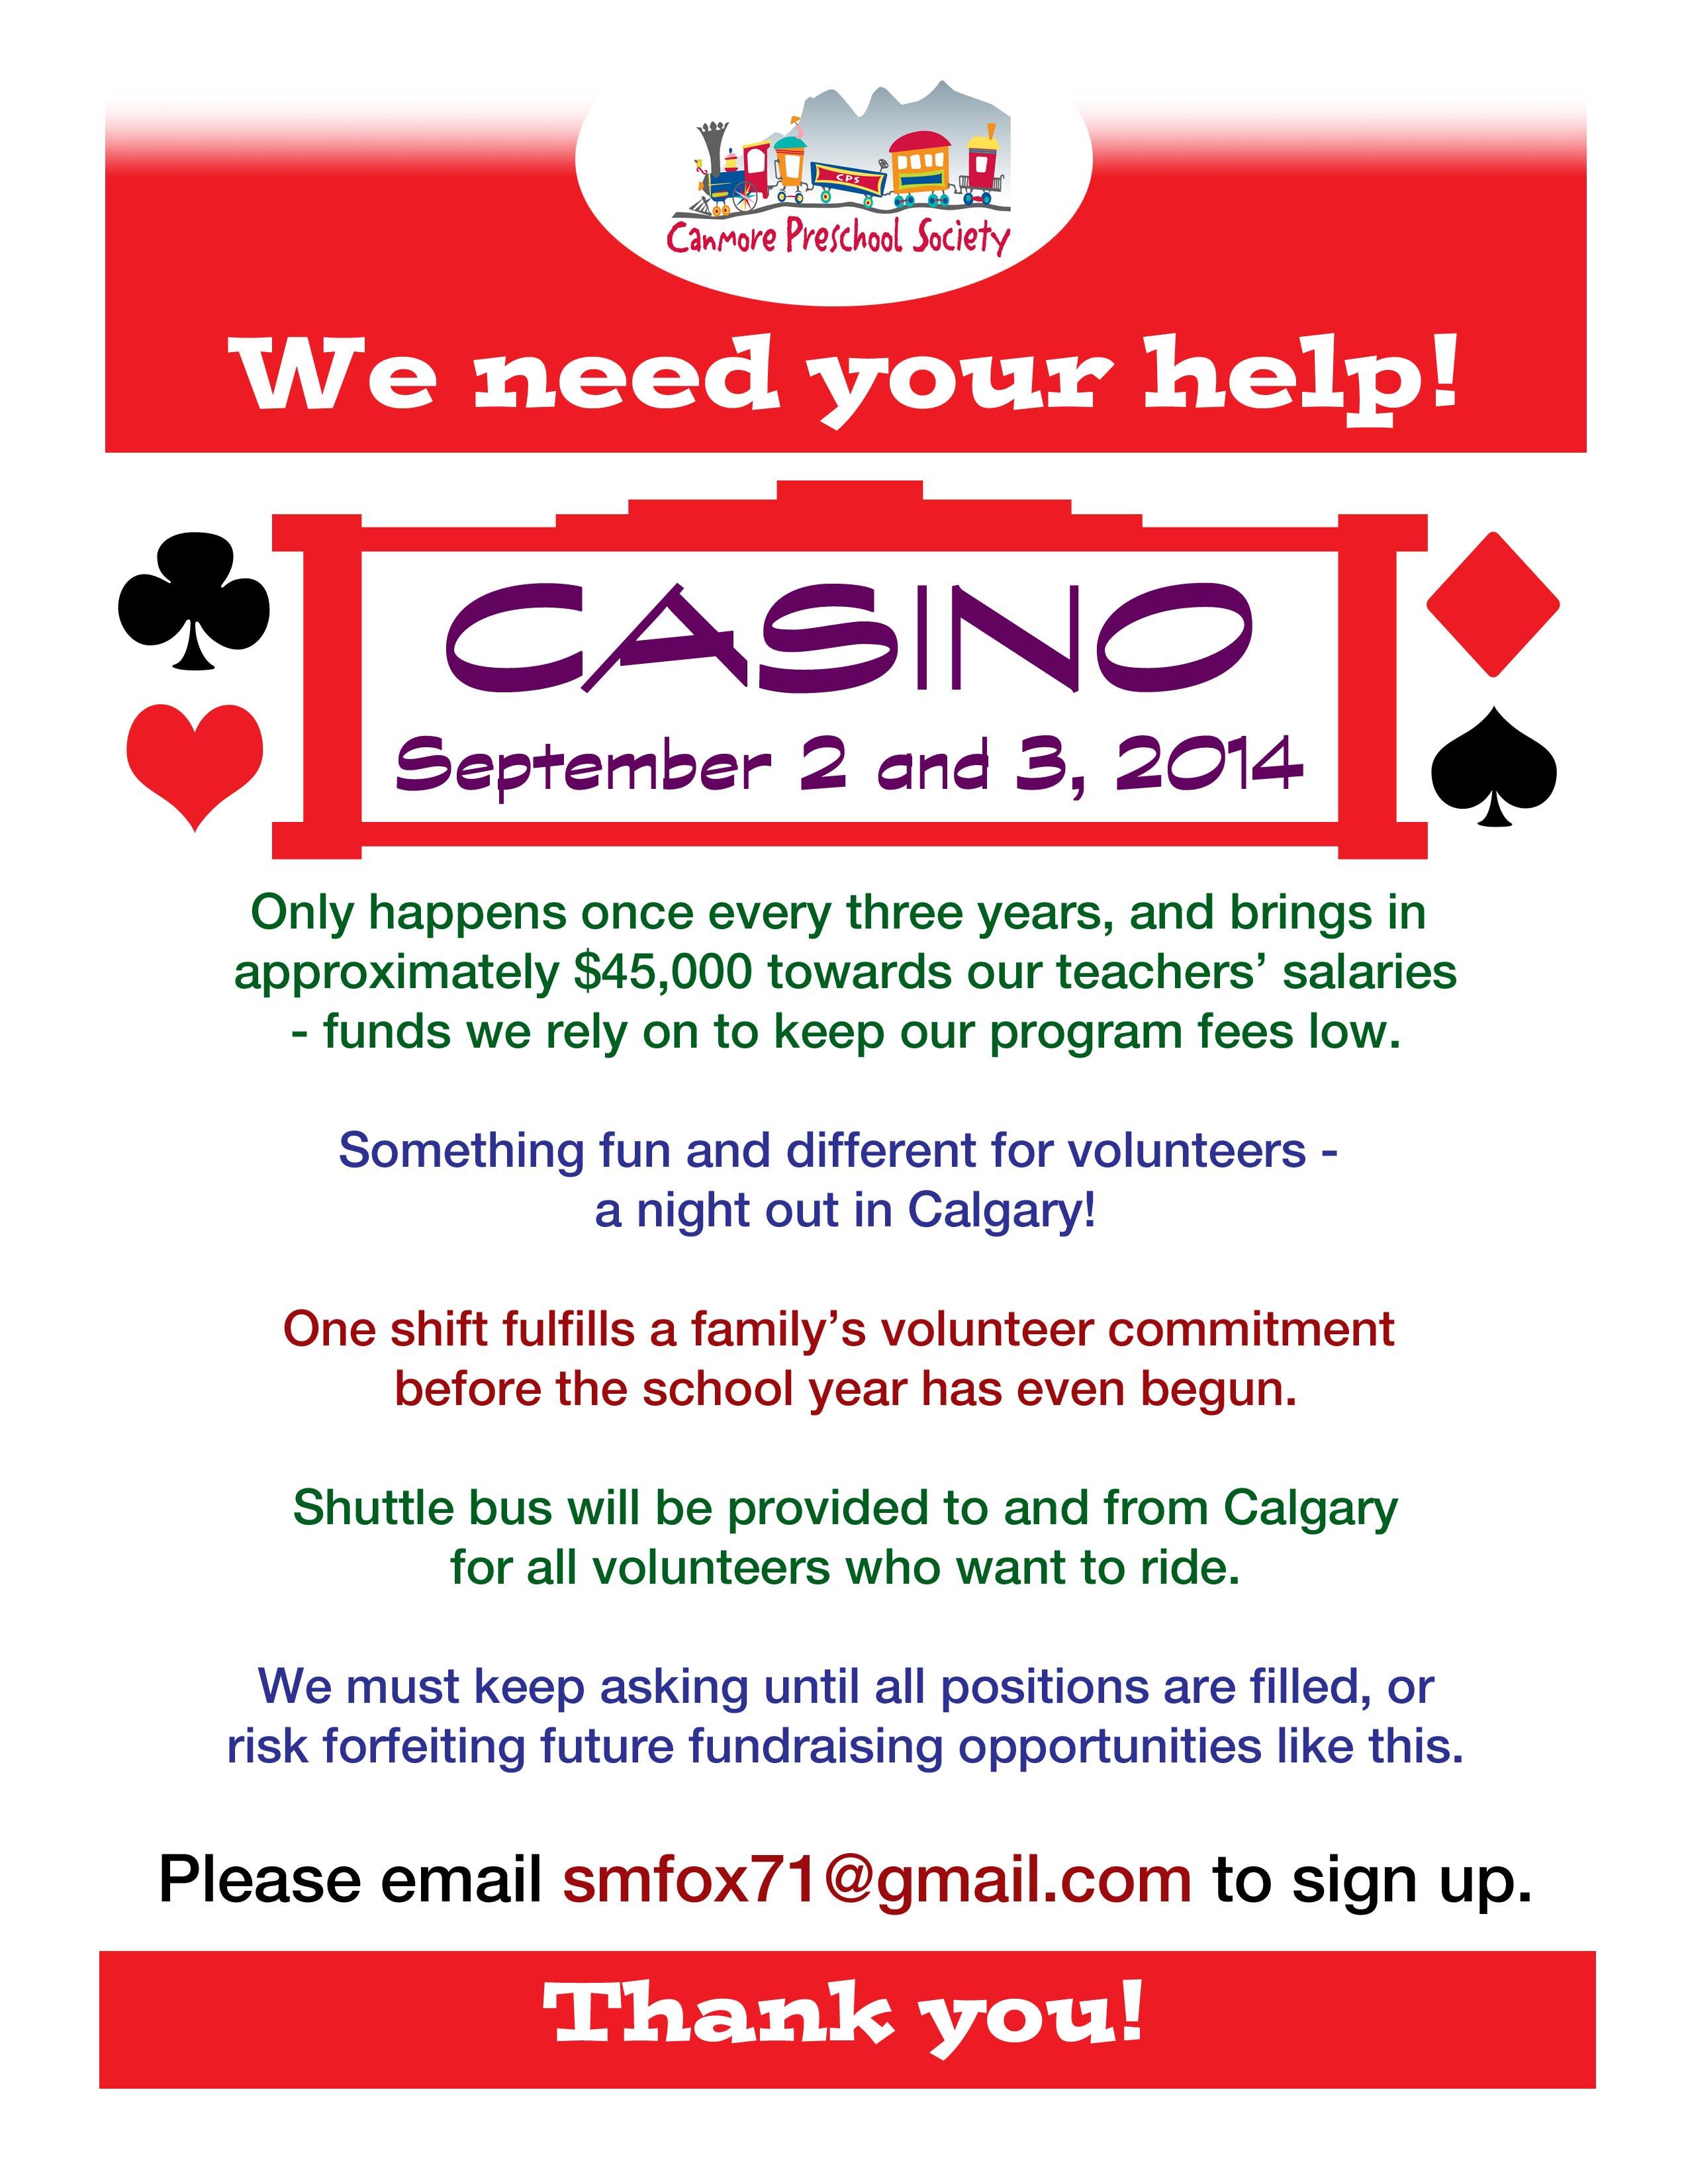 Casino in calgary volunteering worksheets gambling increases crime rate